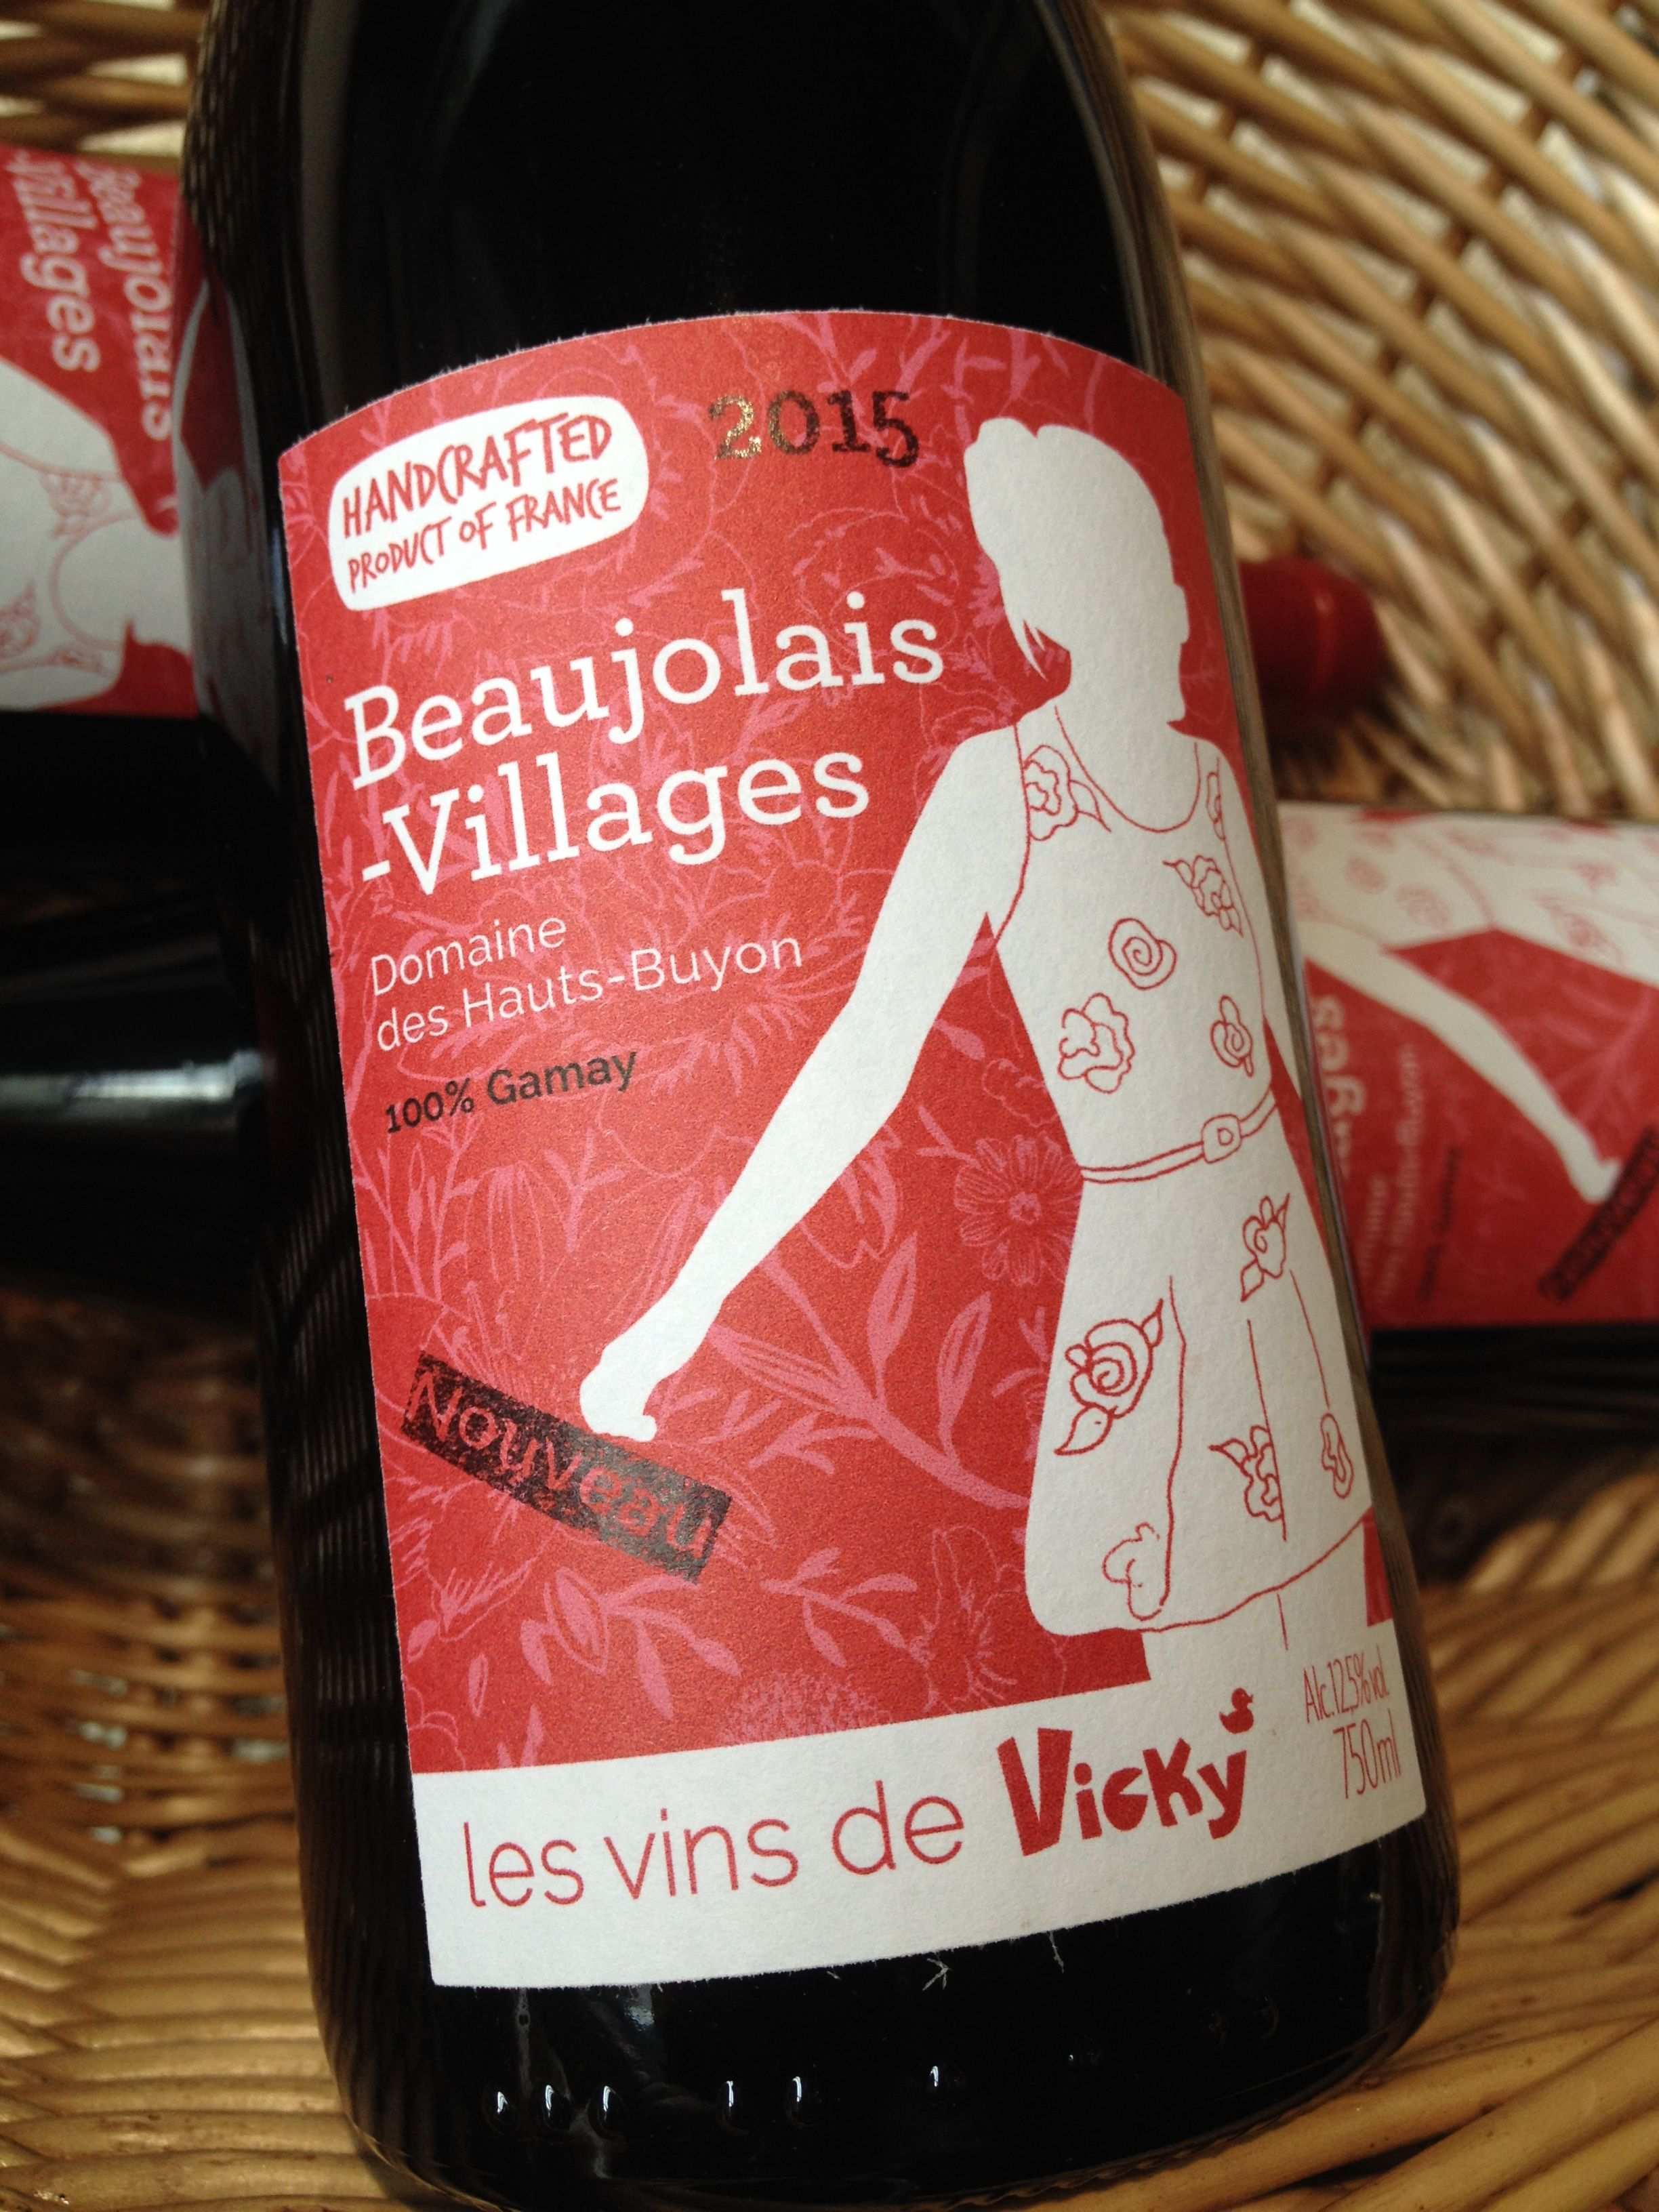 Miss Vicky Beaujolais Nouveau 2015 Wines Beaujolais Nouveau Wine Making